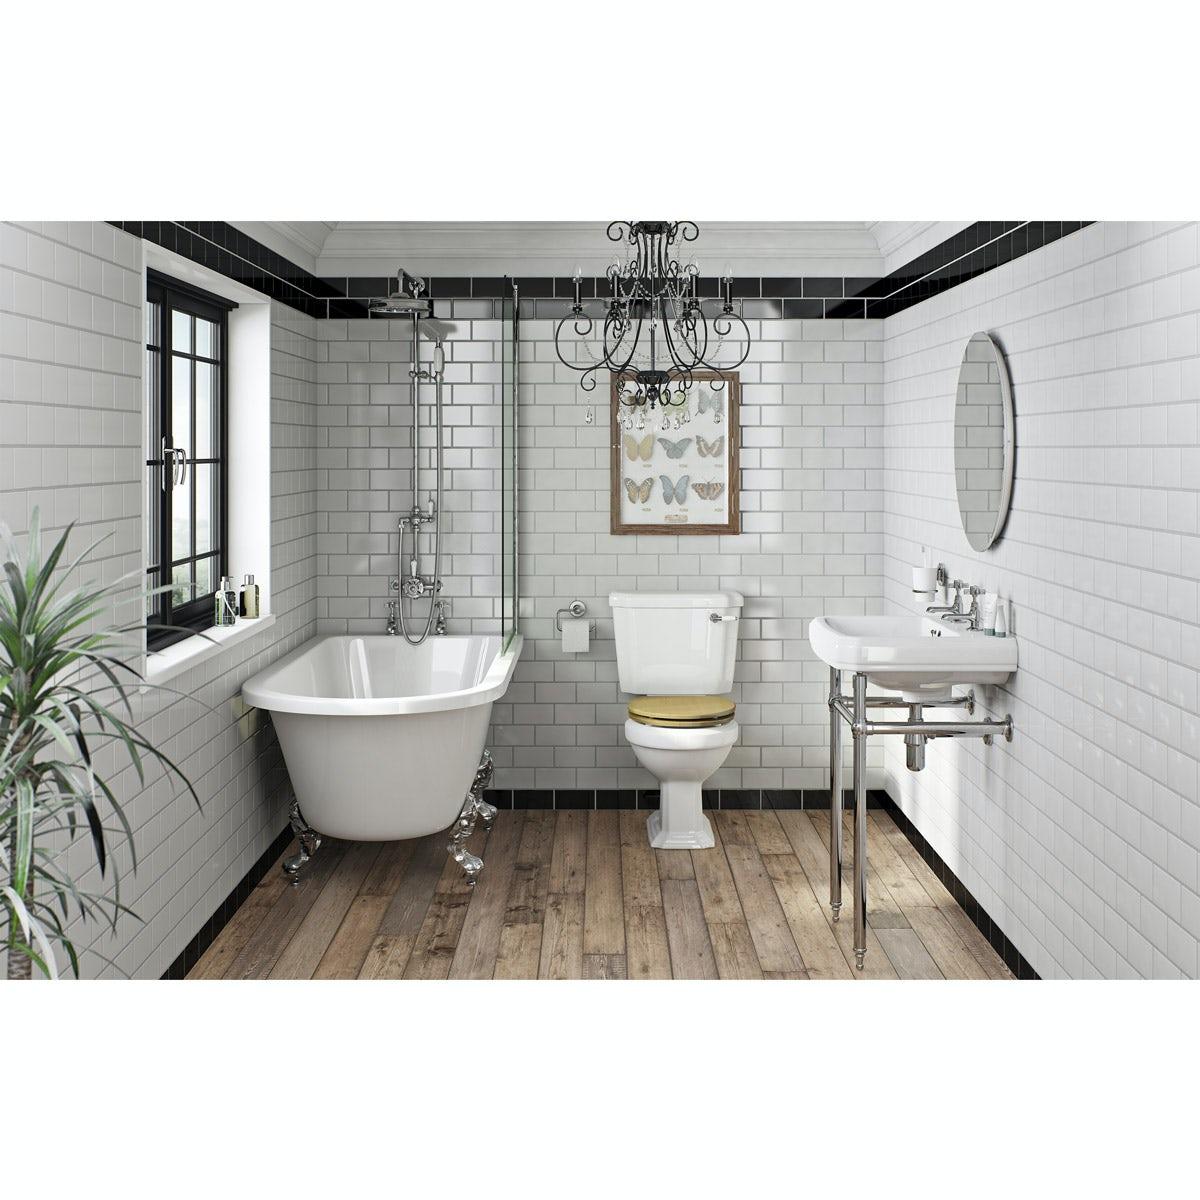 The Bath Co. Dulwich oak bathroom suite with freestanding shower bath